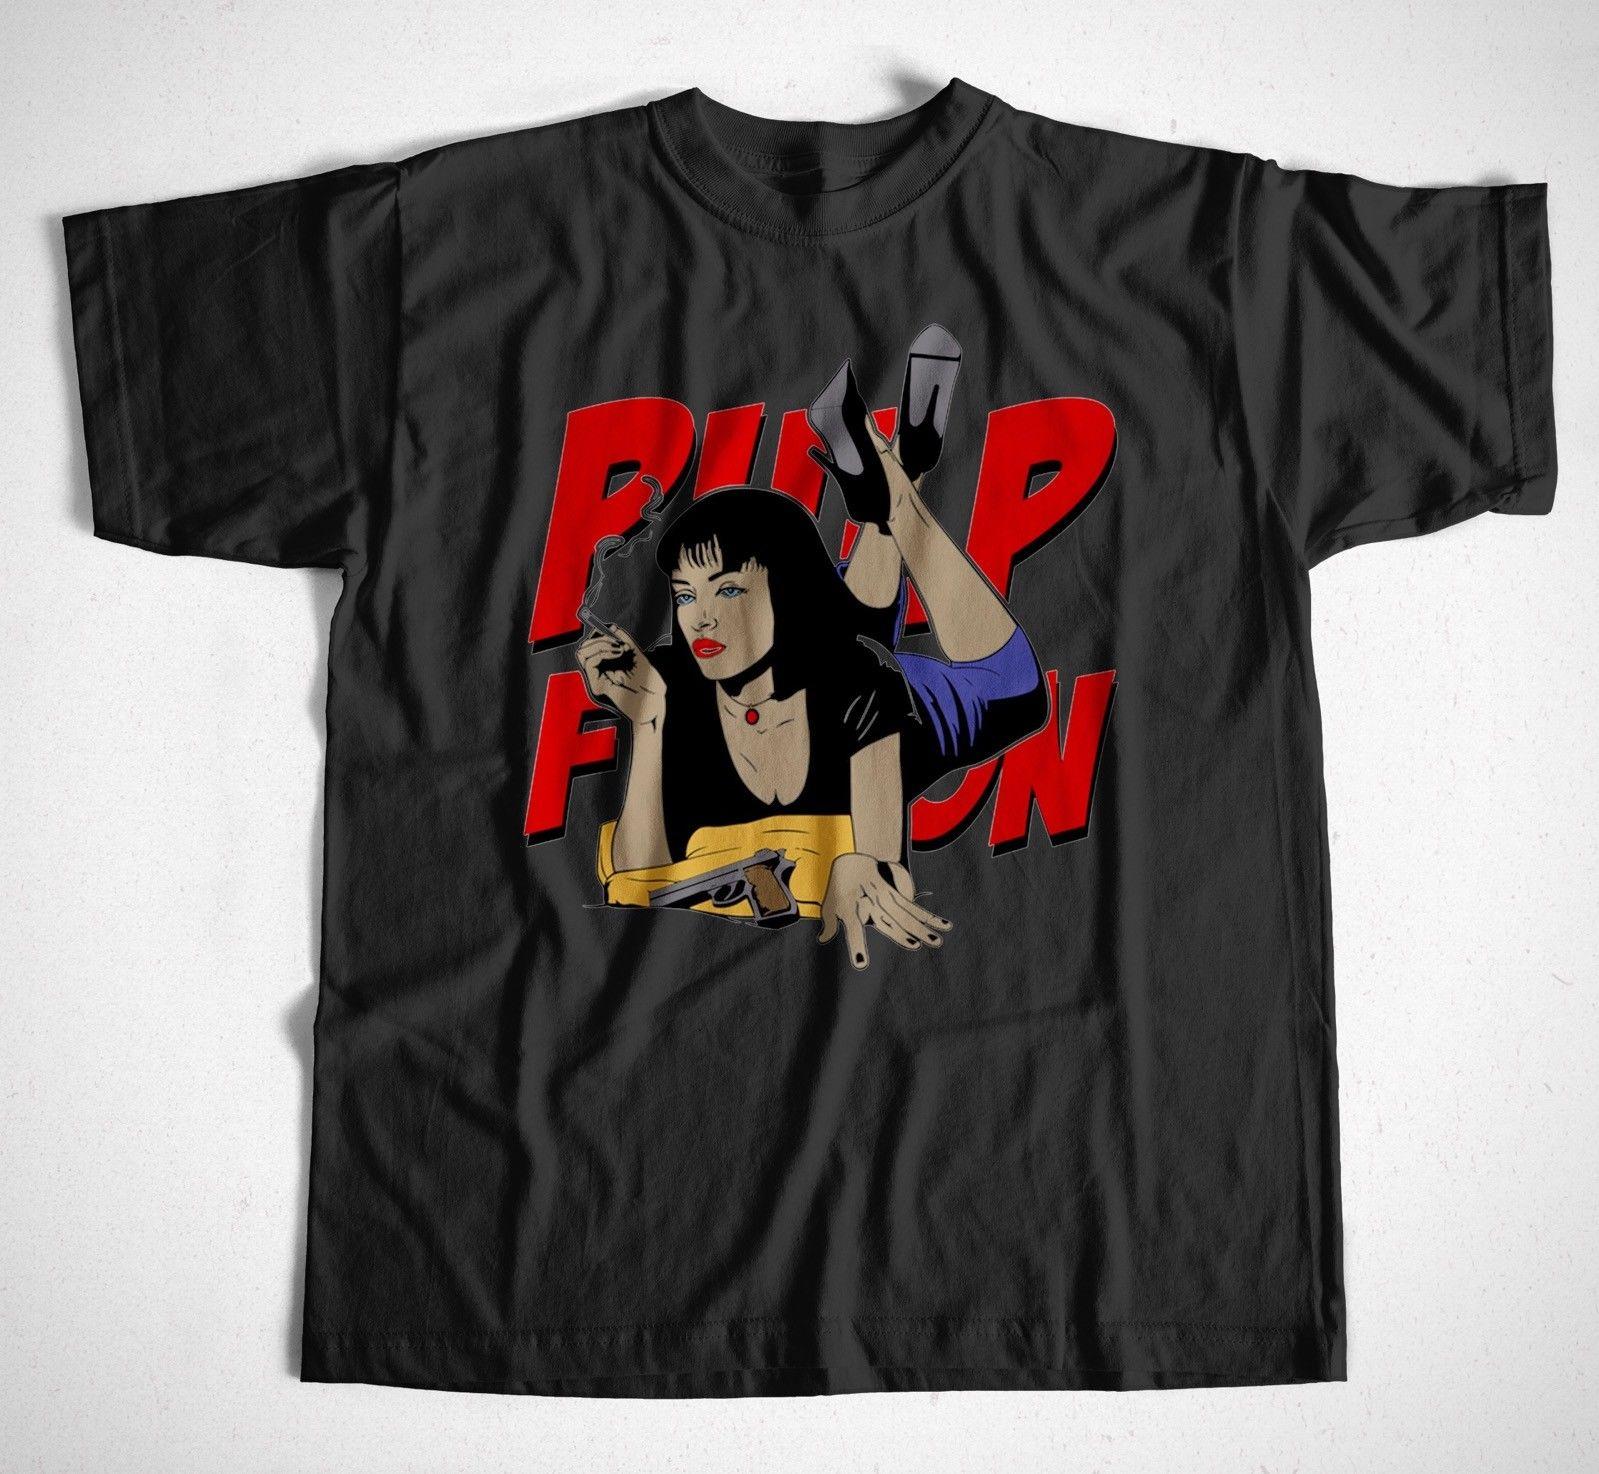 2018-funny-o-neck-t-shirt-t-shirt-pulp-fiction-1-s-4xl-mia-quentin-font-b-tarantino-b-font-deathproof-reservier-dogs-summer-tee-shirt